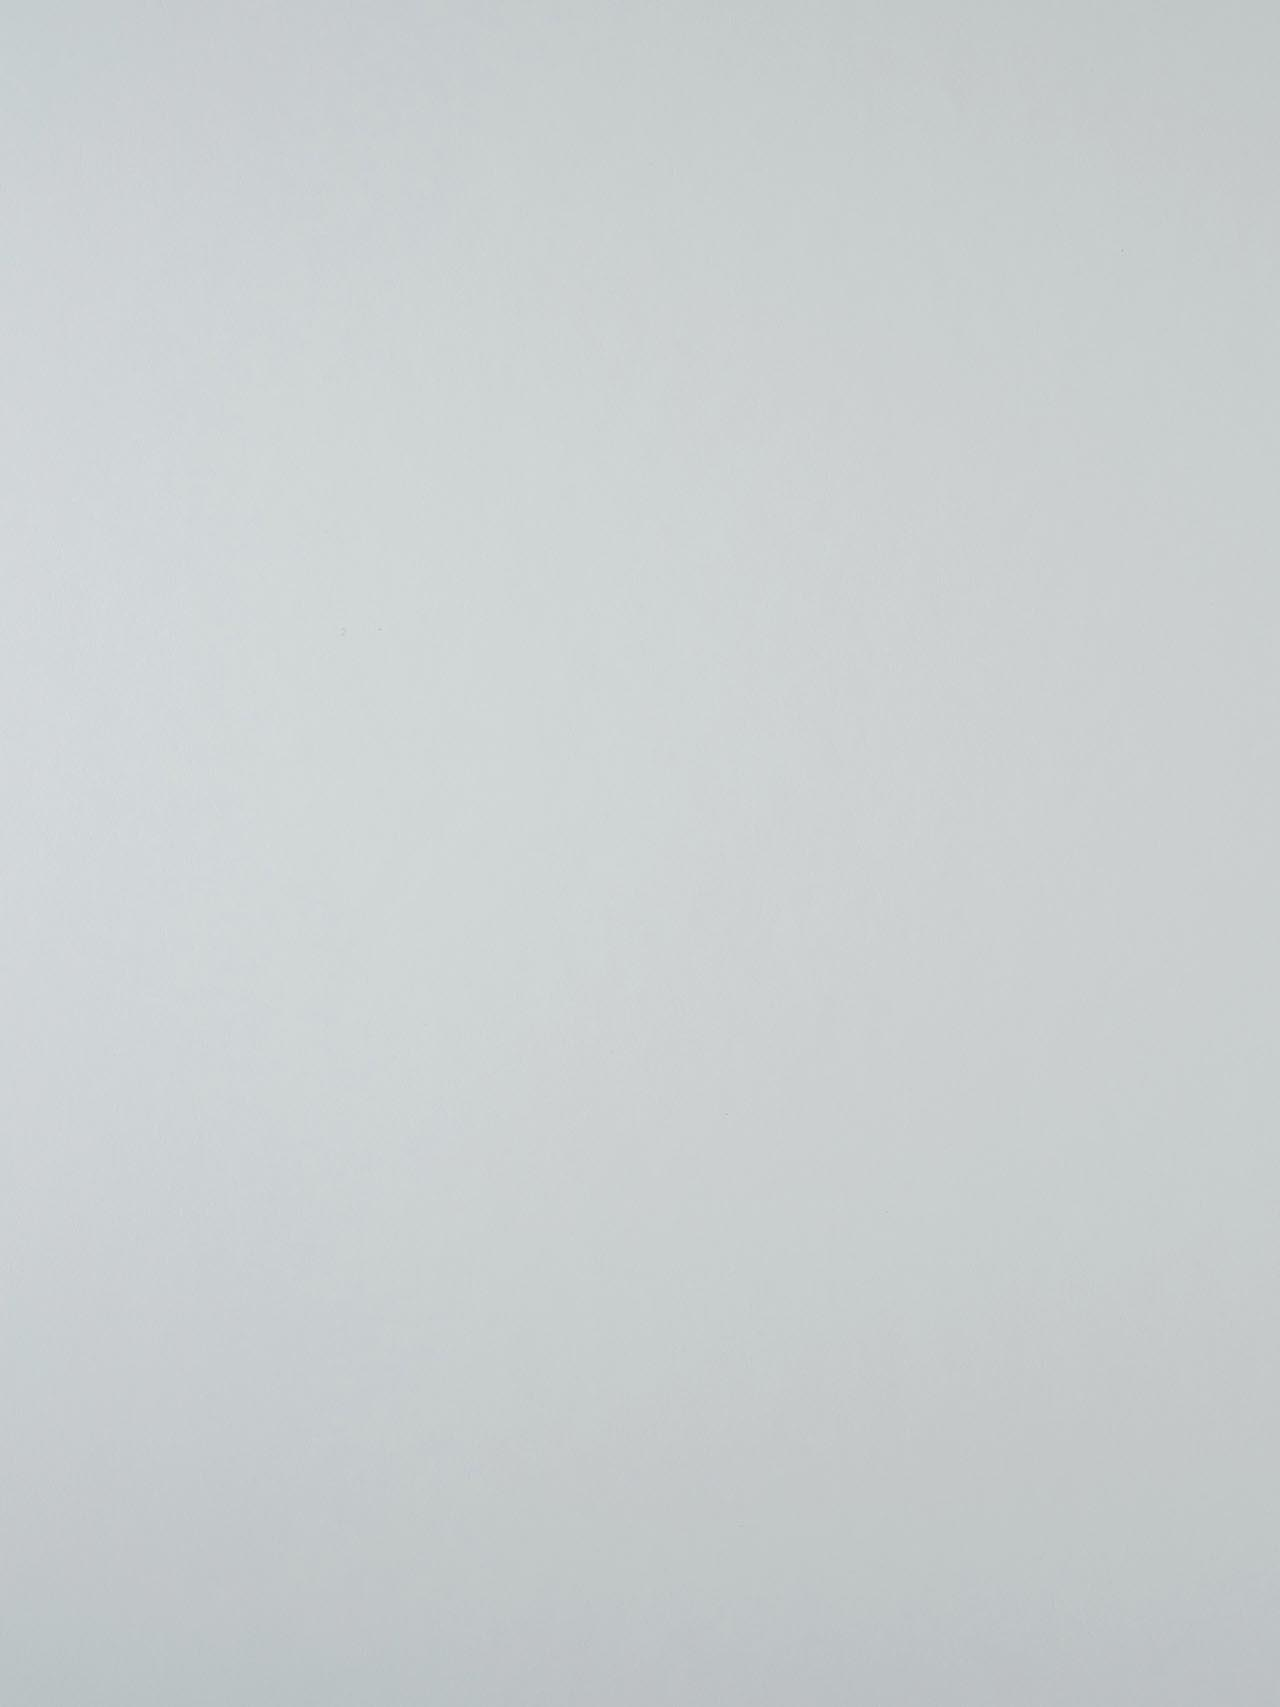 ДСП BO73 18мм Talco/Fiocco 2800х2070мм